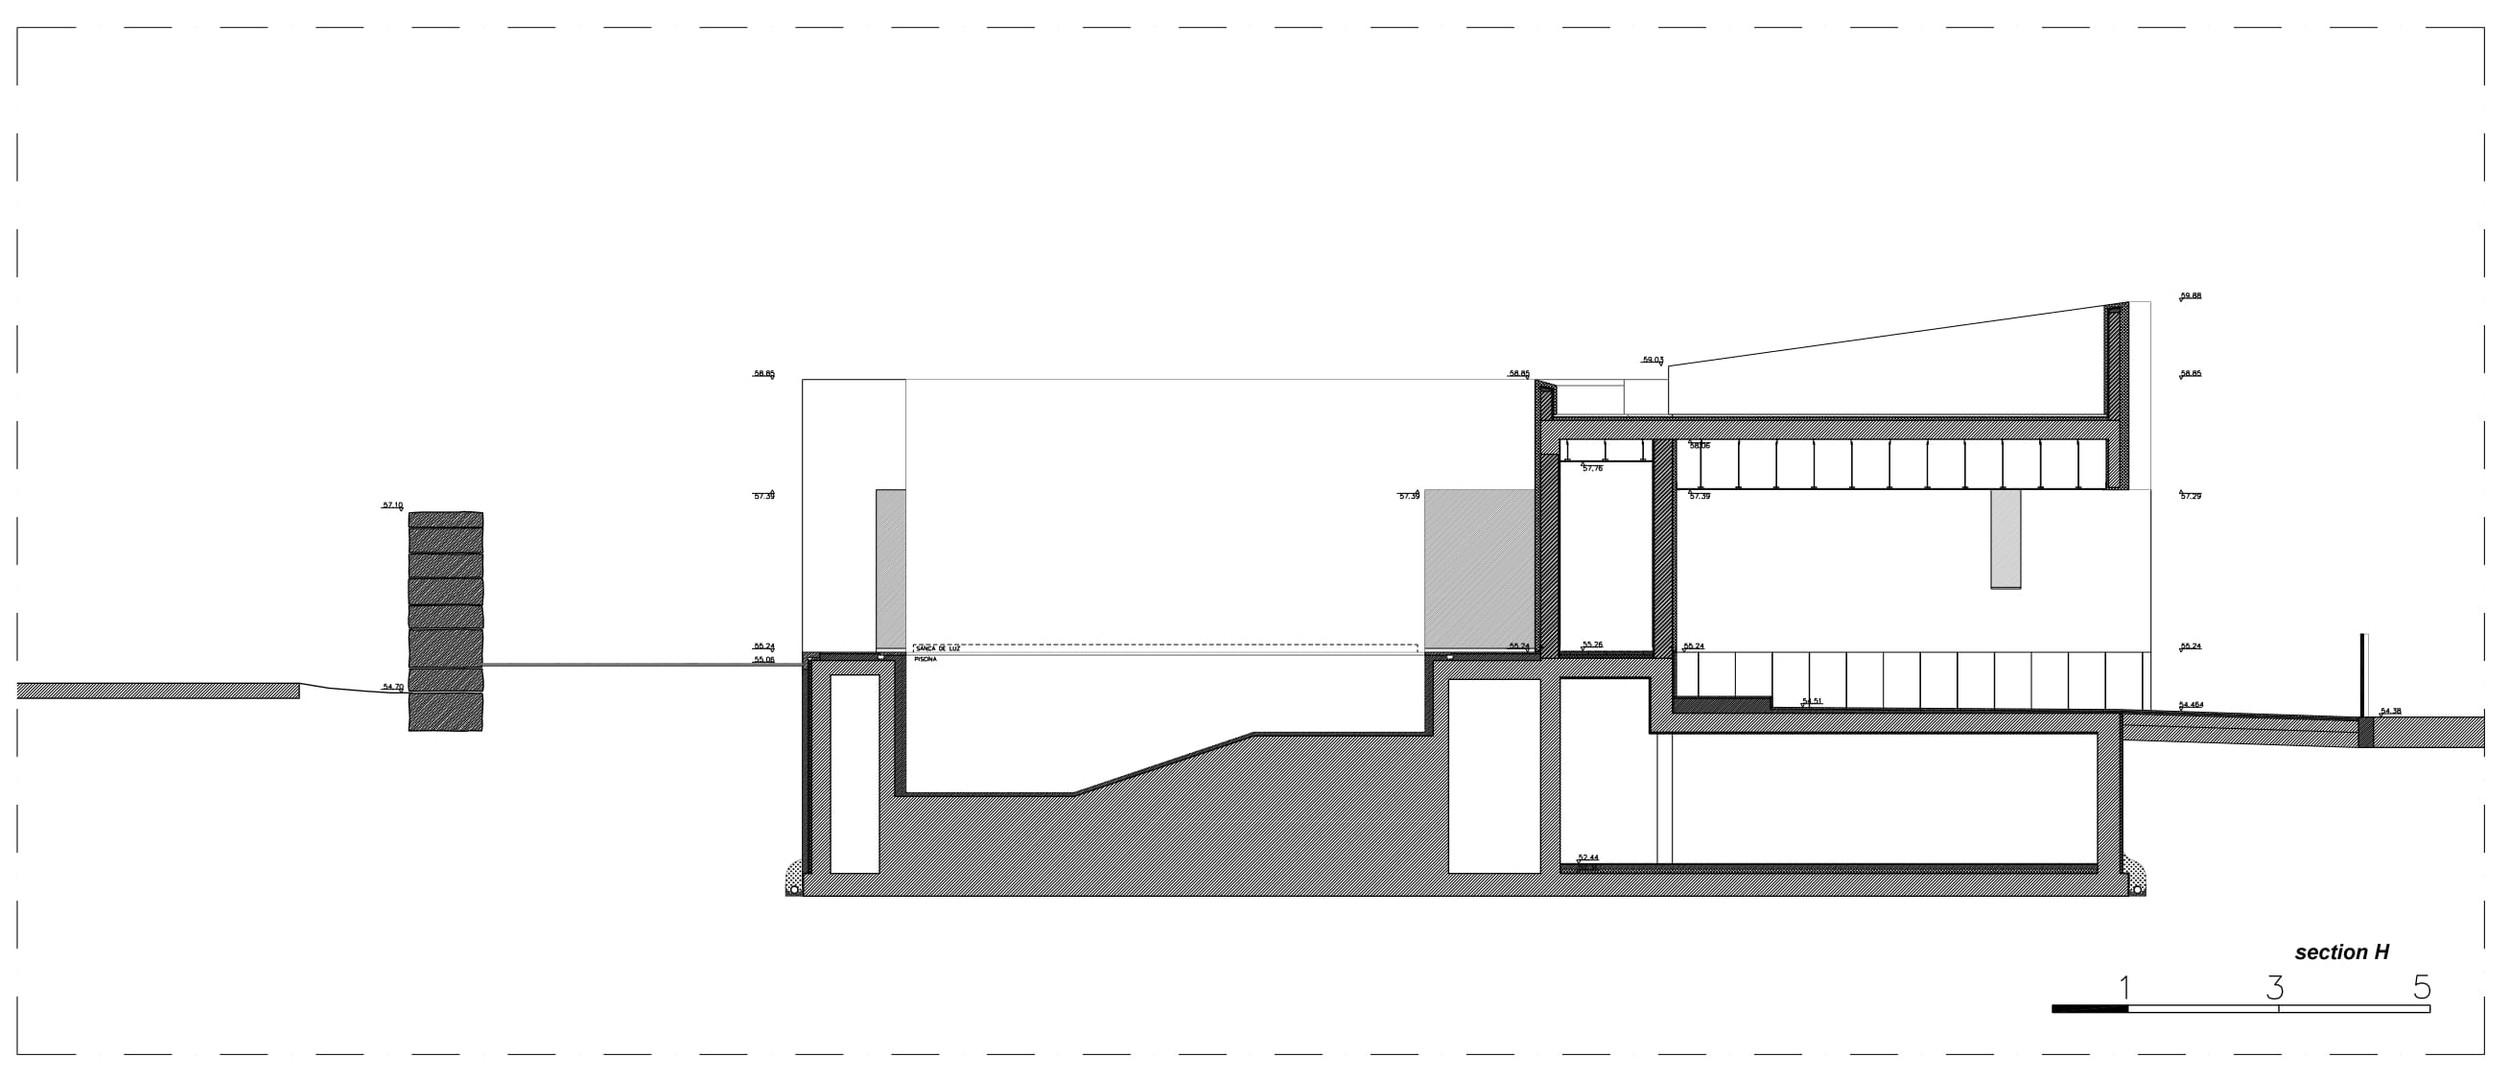 sectionH-1.jpg